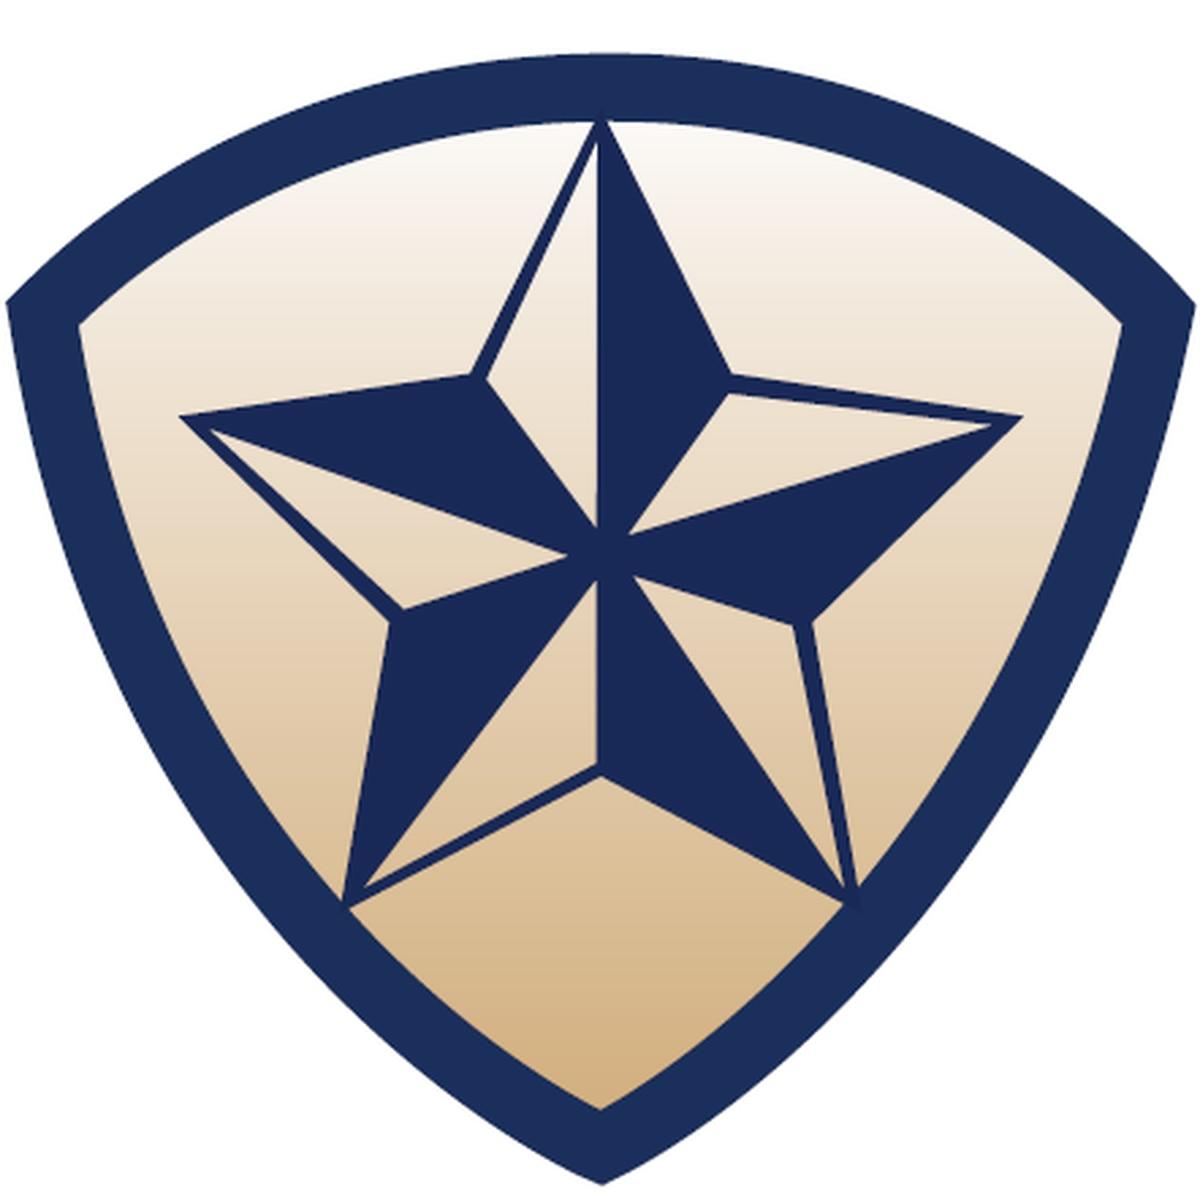 East Texas health leaders announce COVID-19 response strategies - KLTV